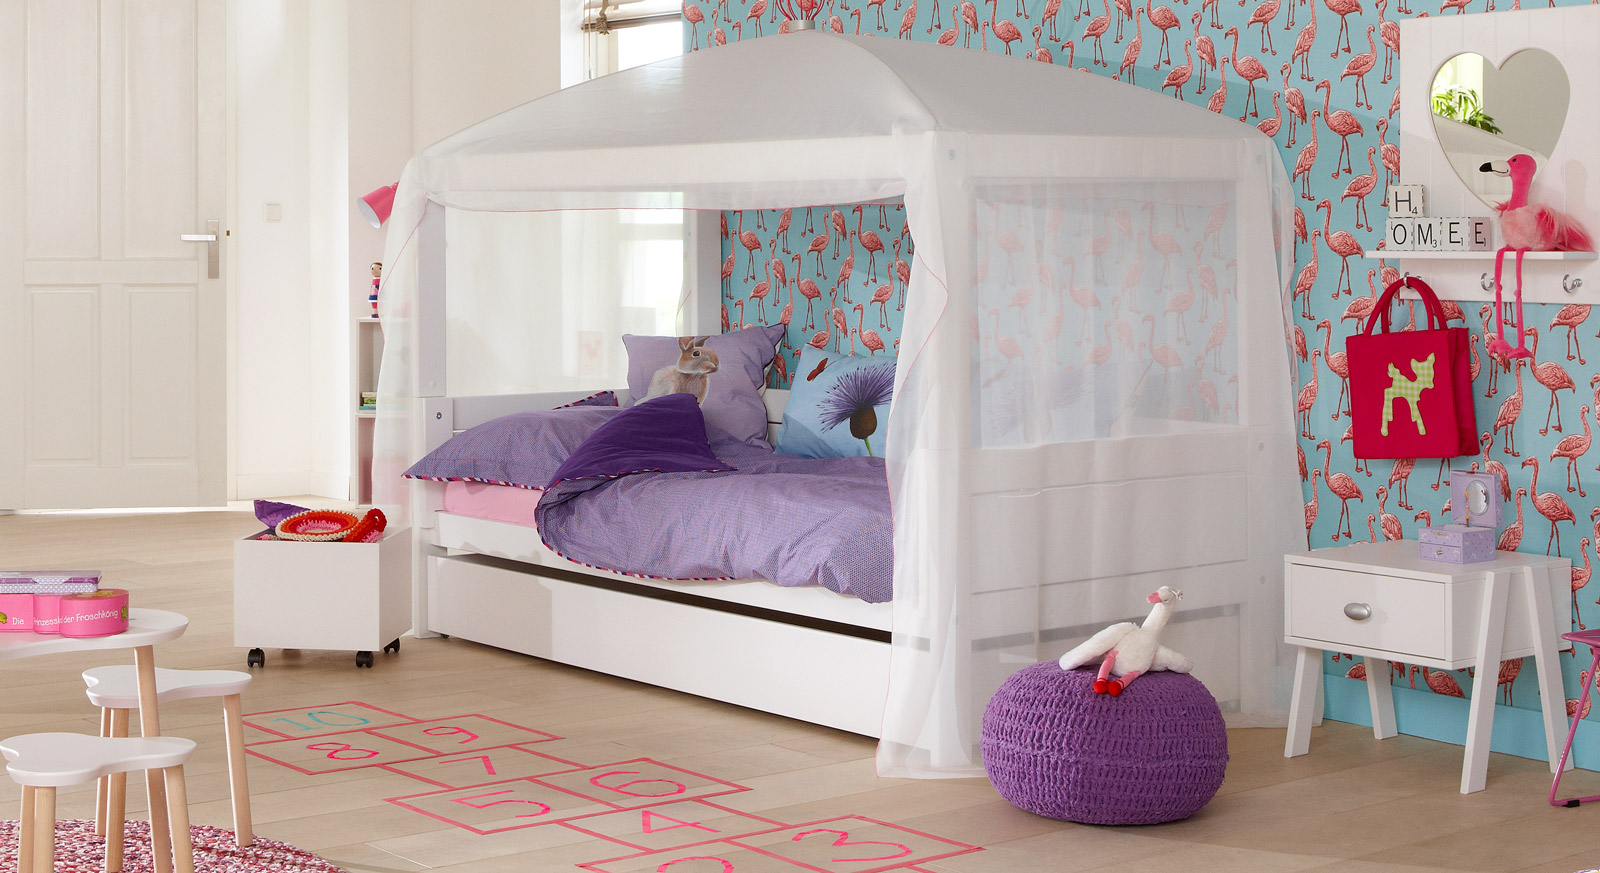 Kinderbett 4-in-1 inklusive Baldachin